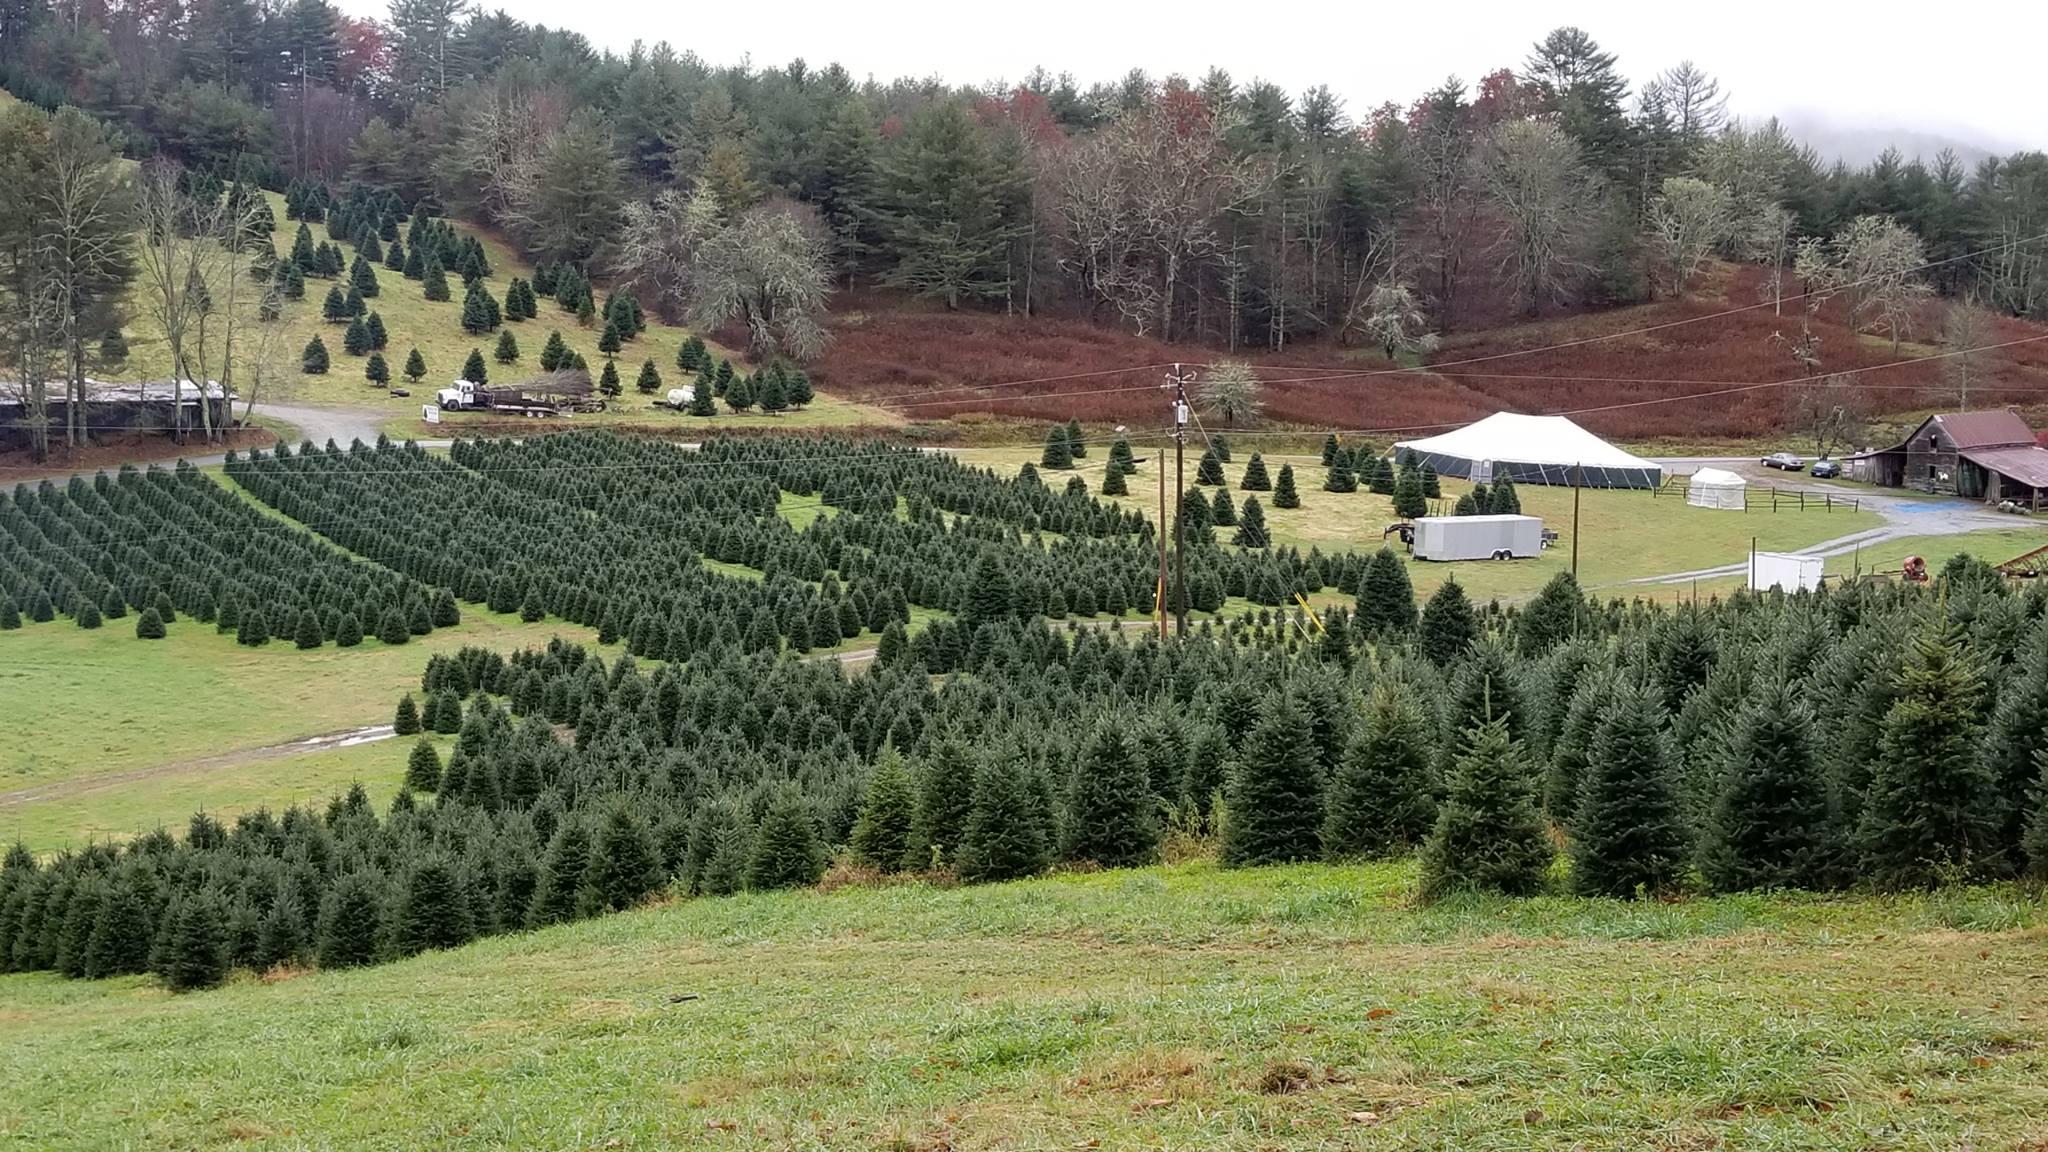 Tom Sawyer S Christmas Tree Farm And Elf Village Hendersonville Com